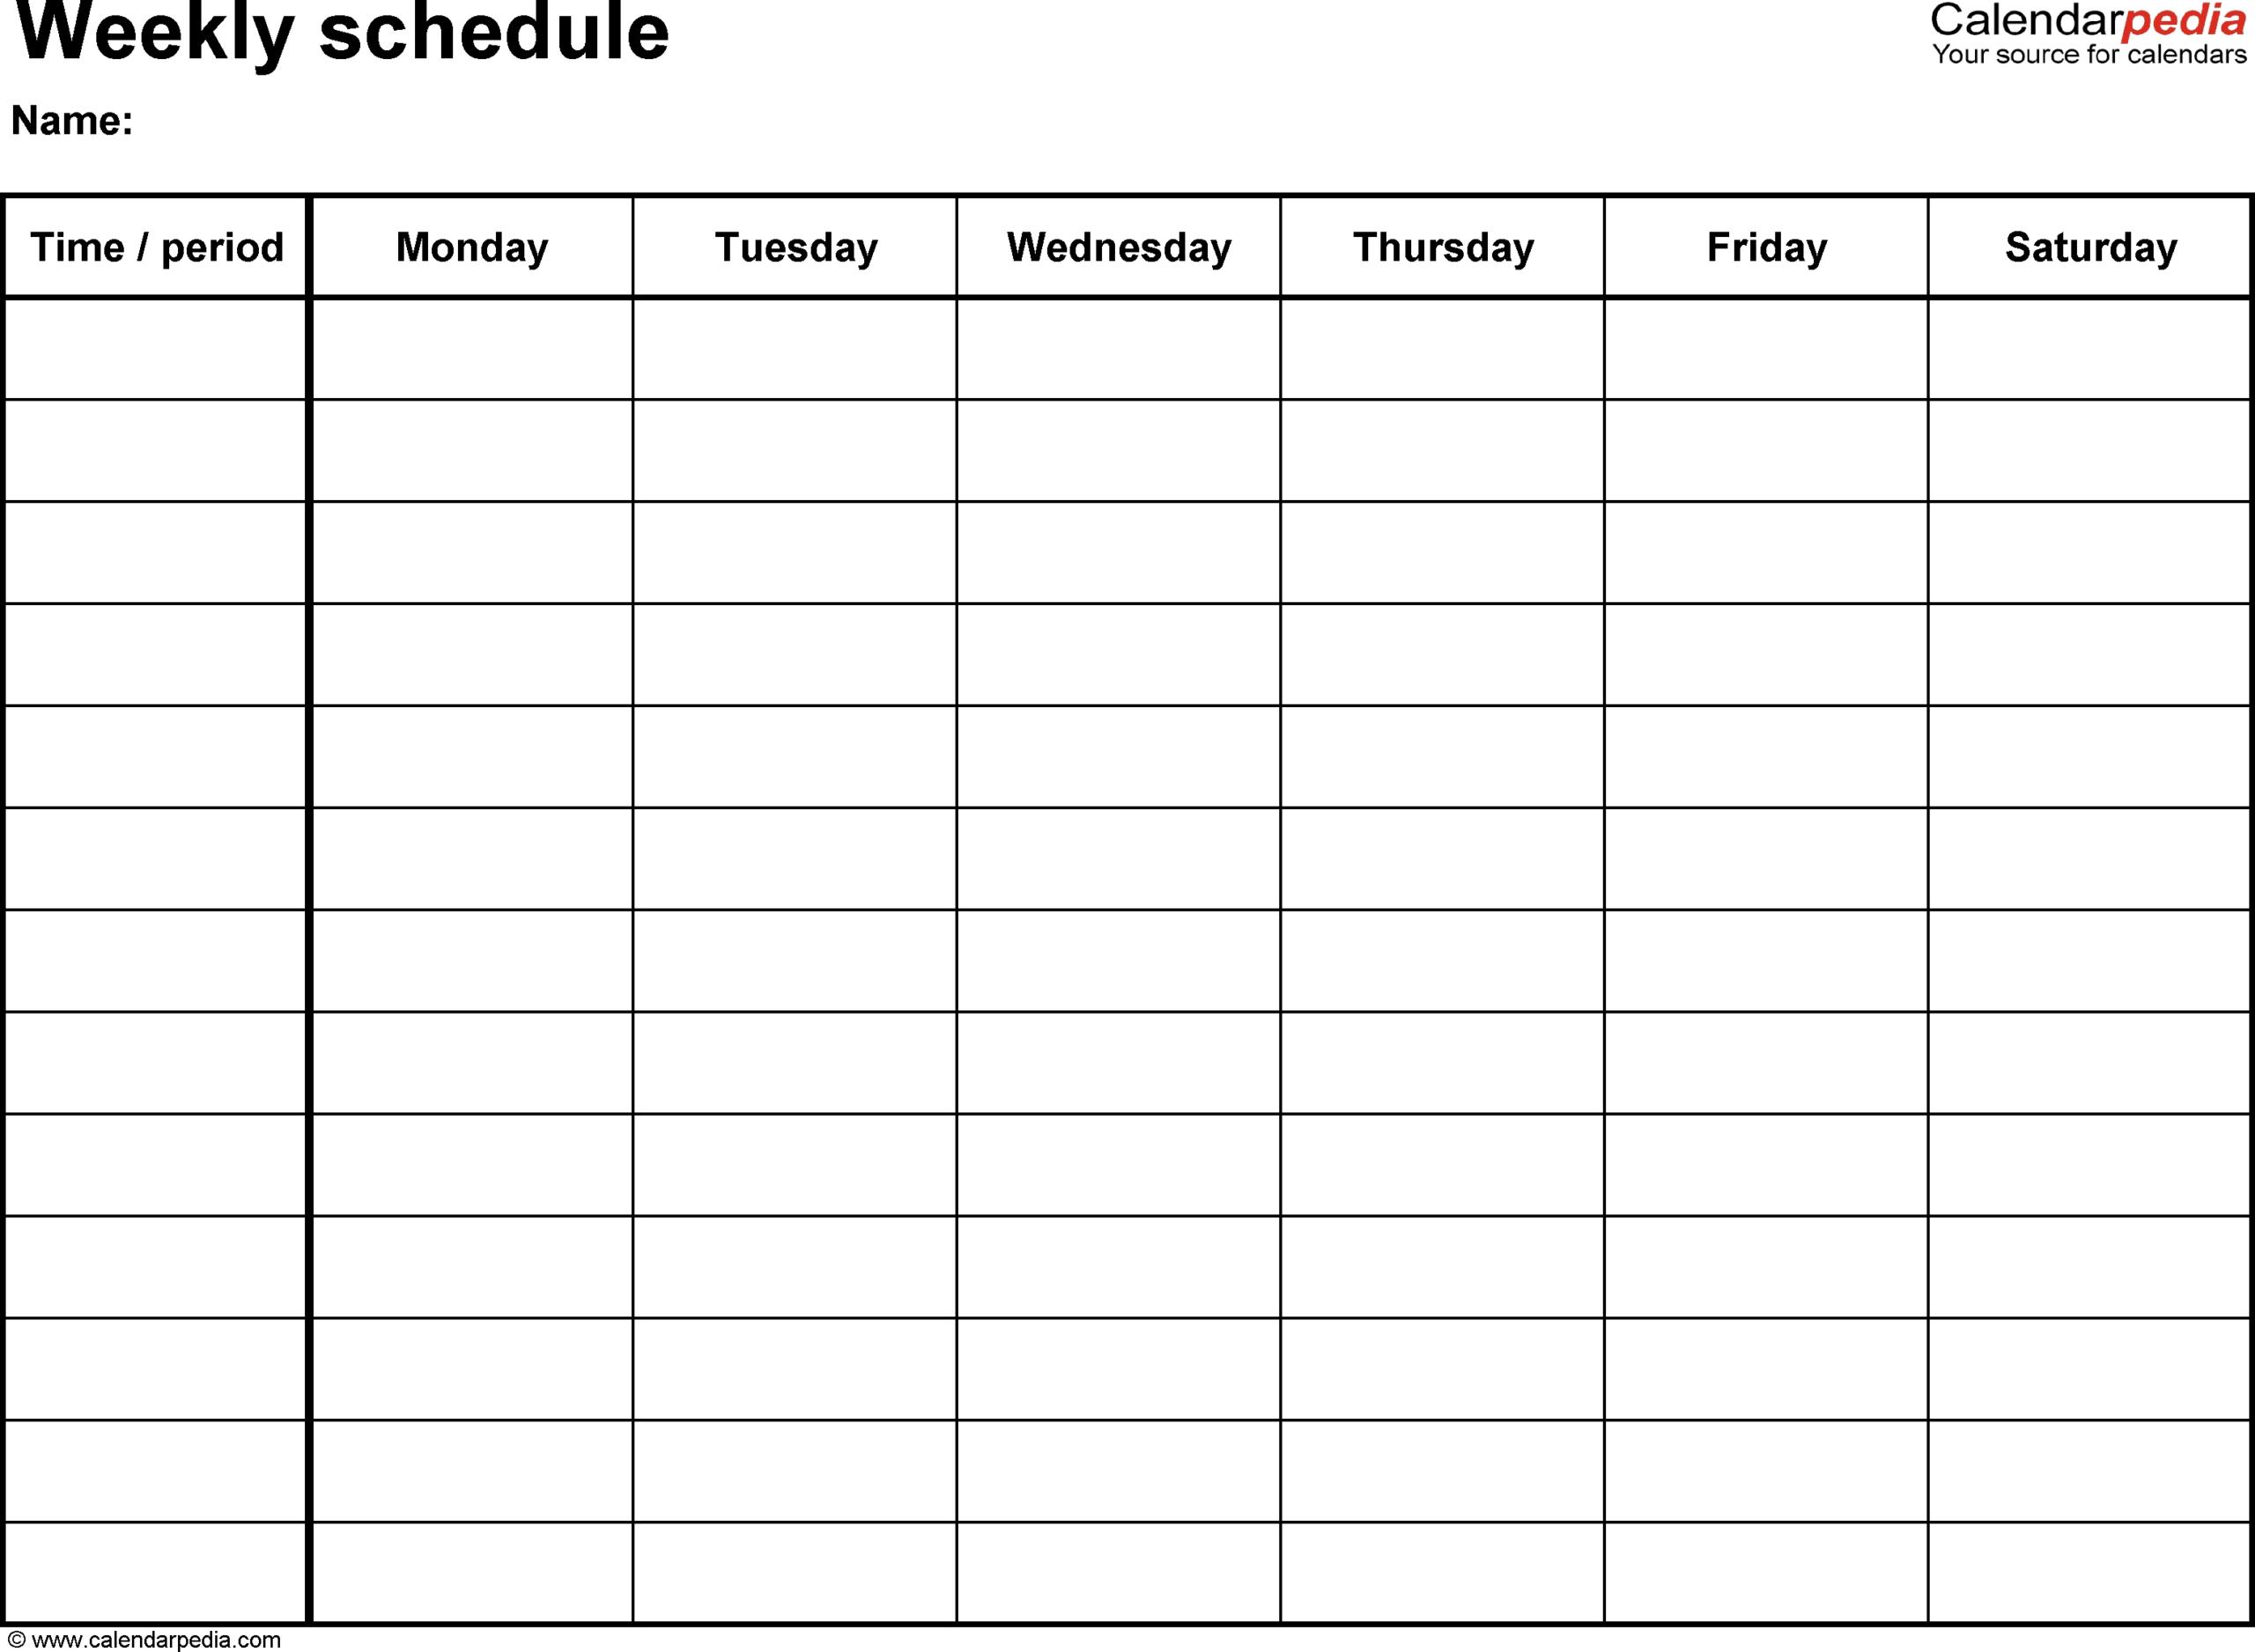 Weekly Calander Lesson Plan Template  Calendar for Lesson Calendar Template